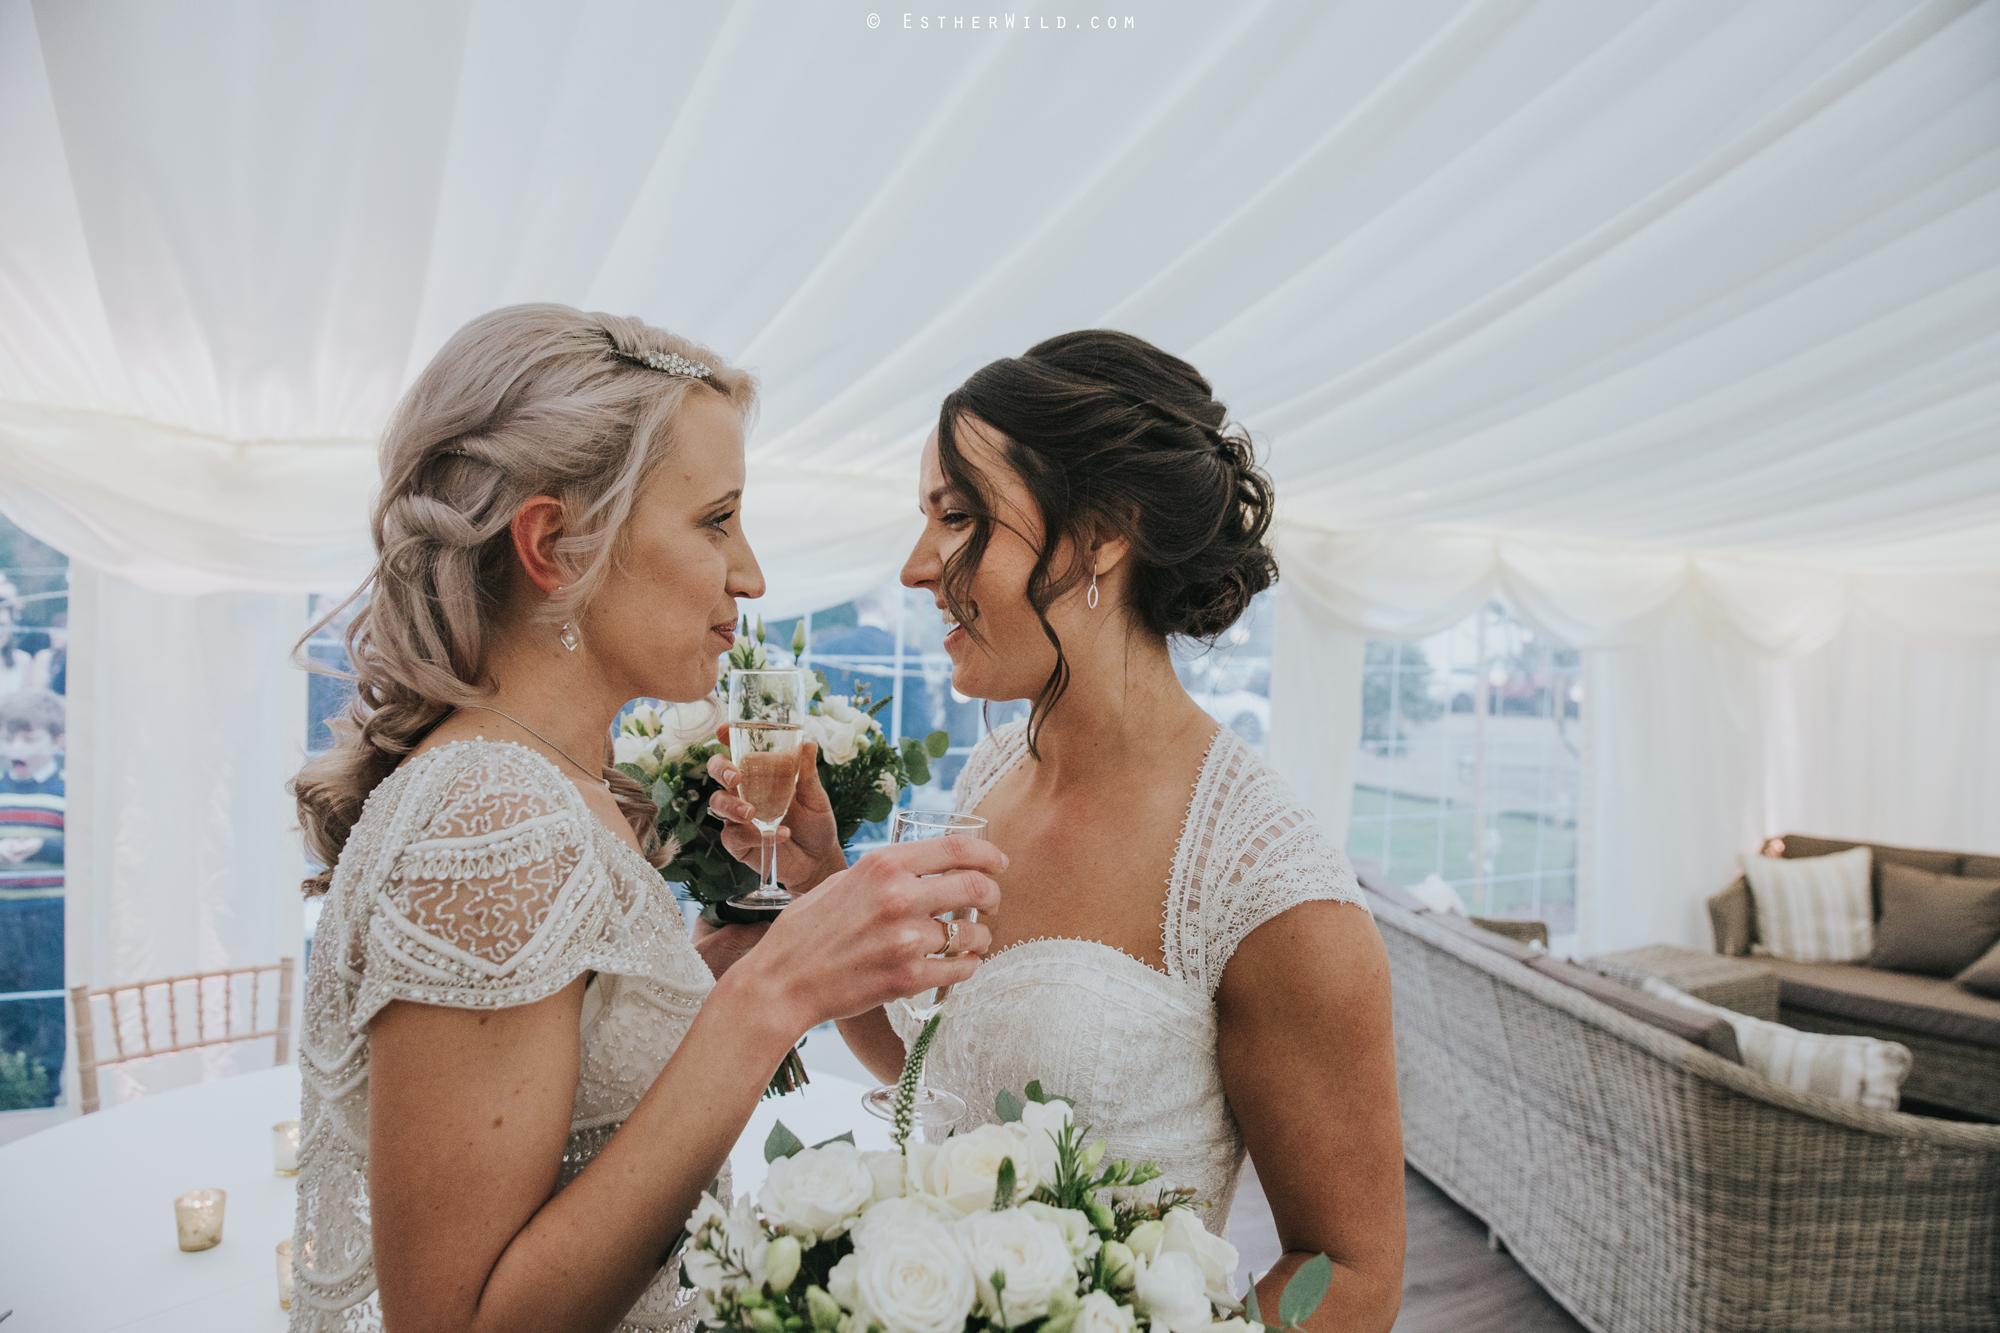 Elms_Barn_Weddings_Suffolk_Photographer_Copyright_Esther_Wild_IMG_1461.jpg